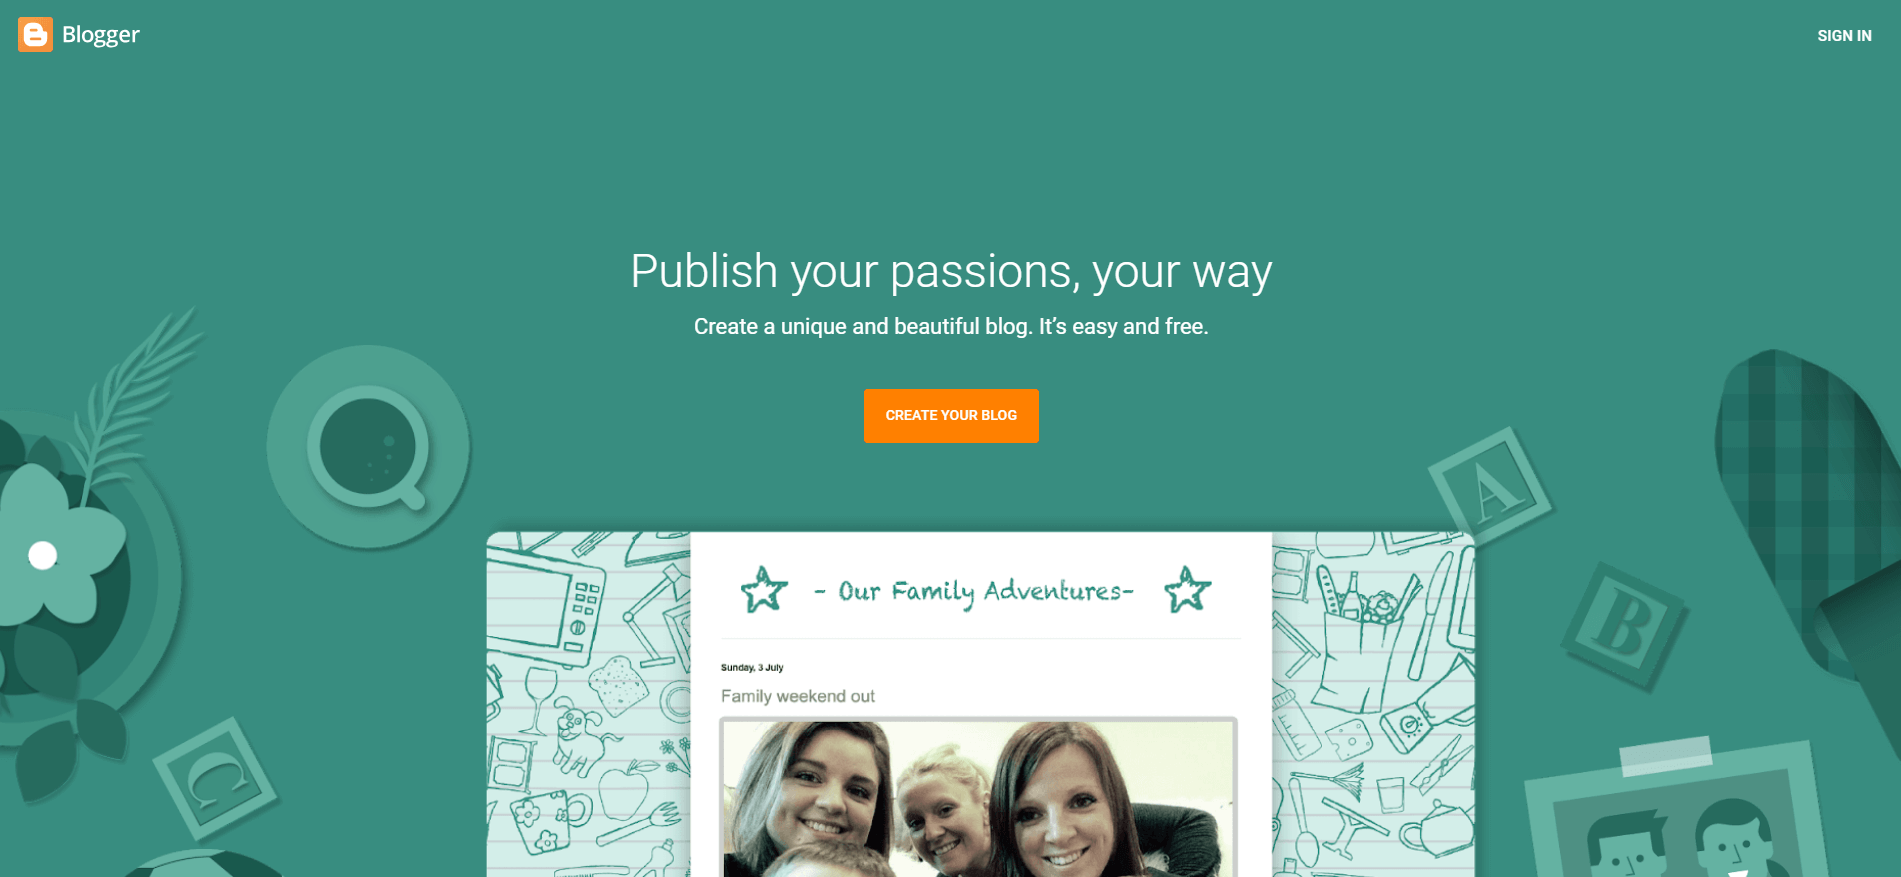 The Blogger website.